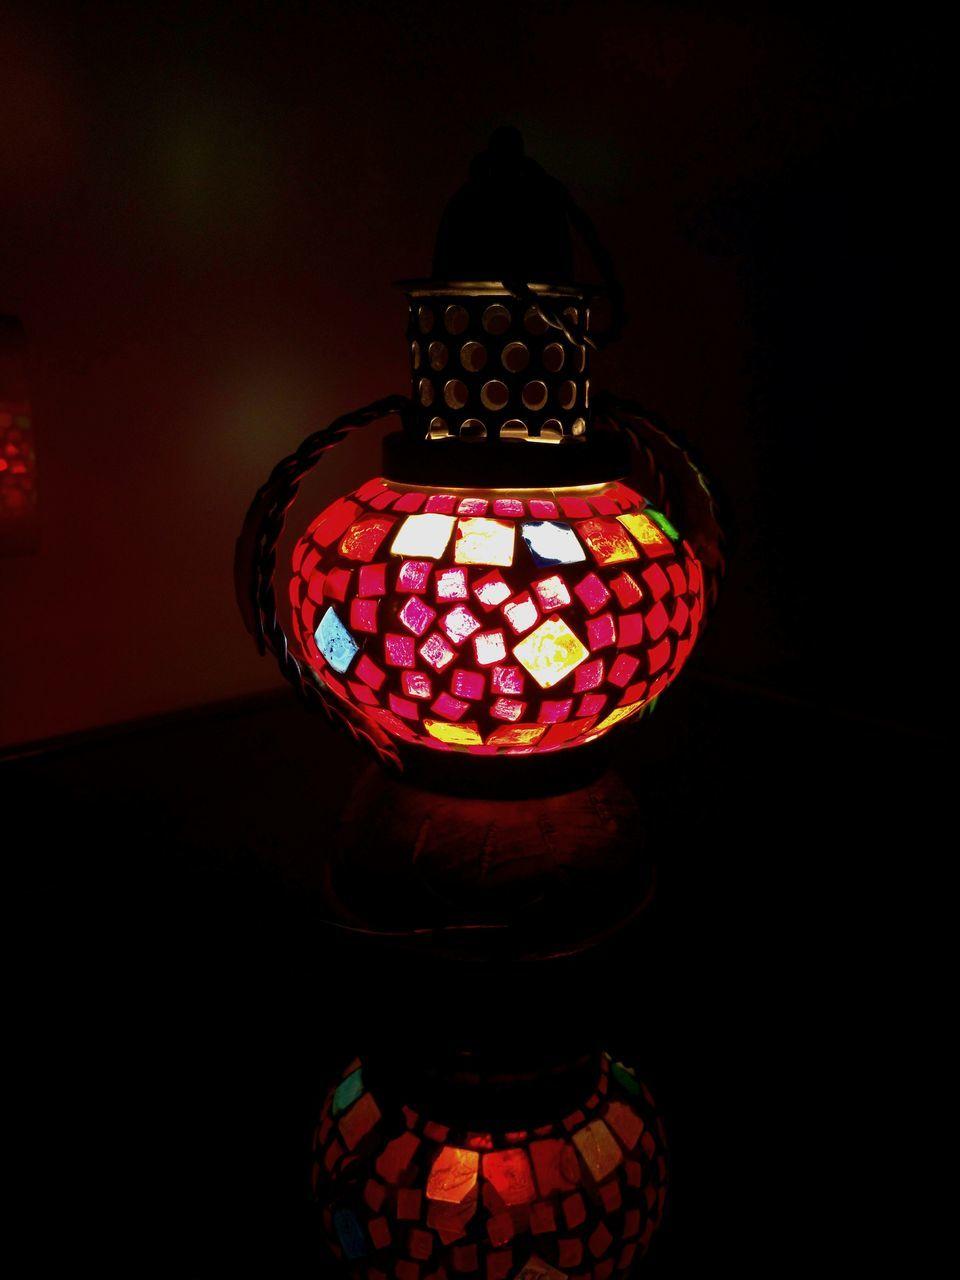 lighting equipment, illuminated, lantern, no people, indoors, multi colored, day